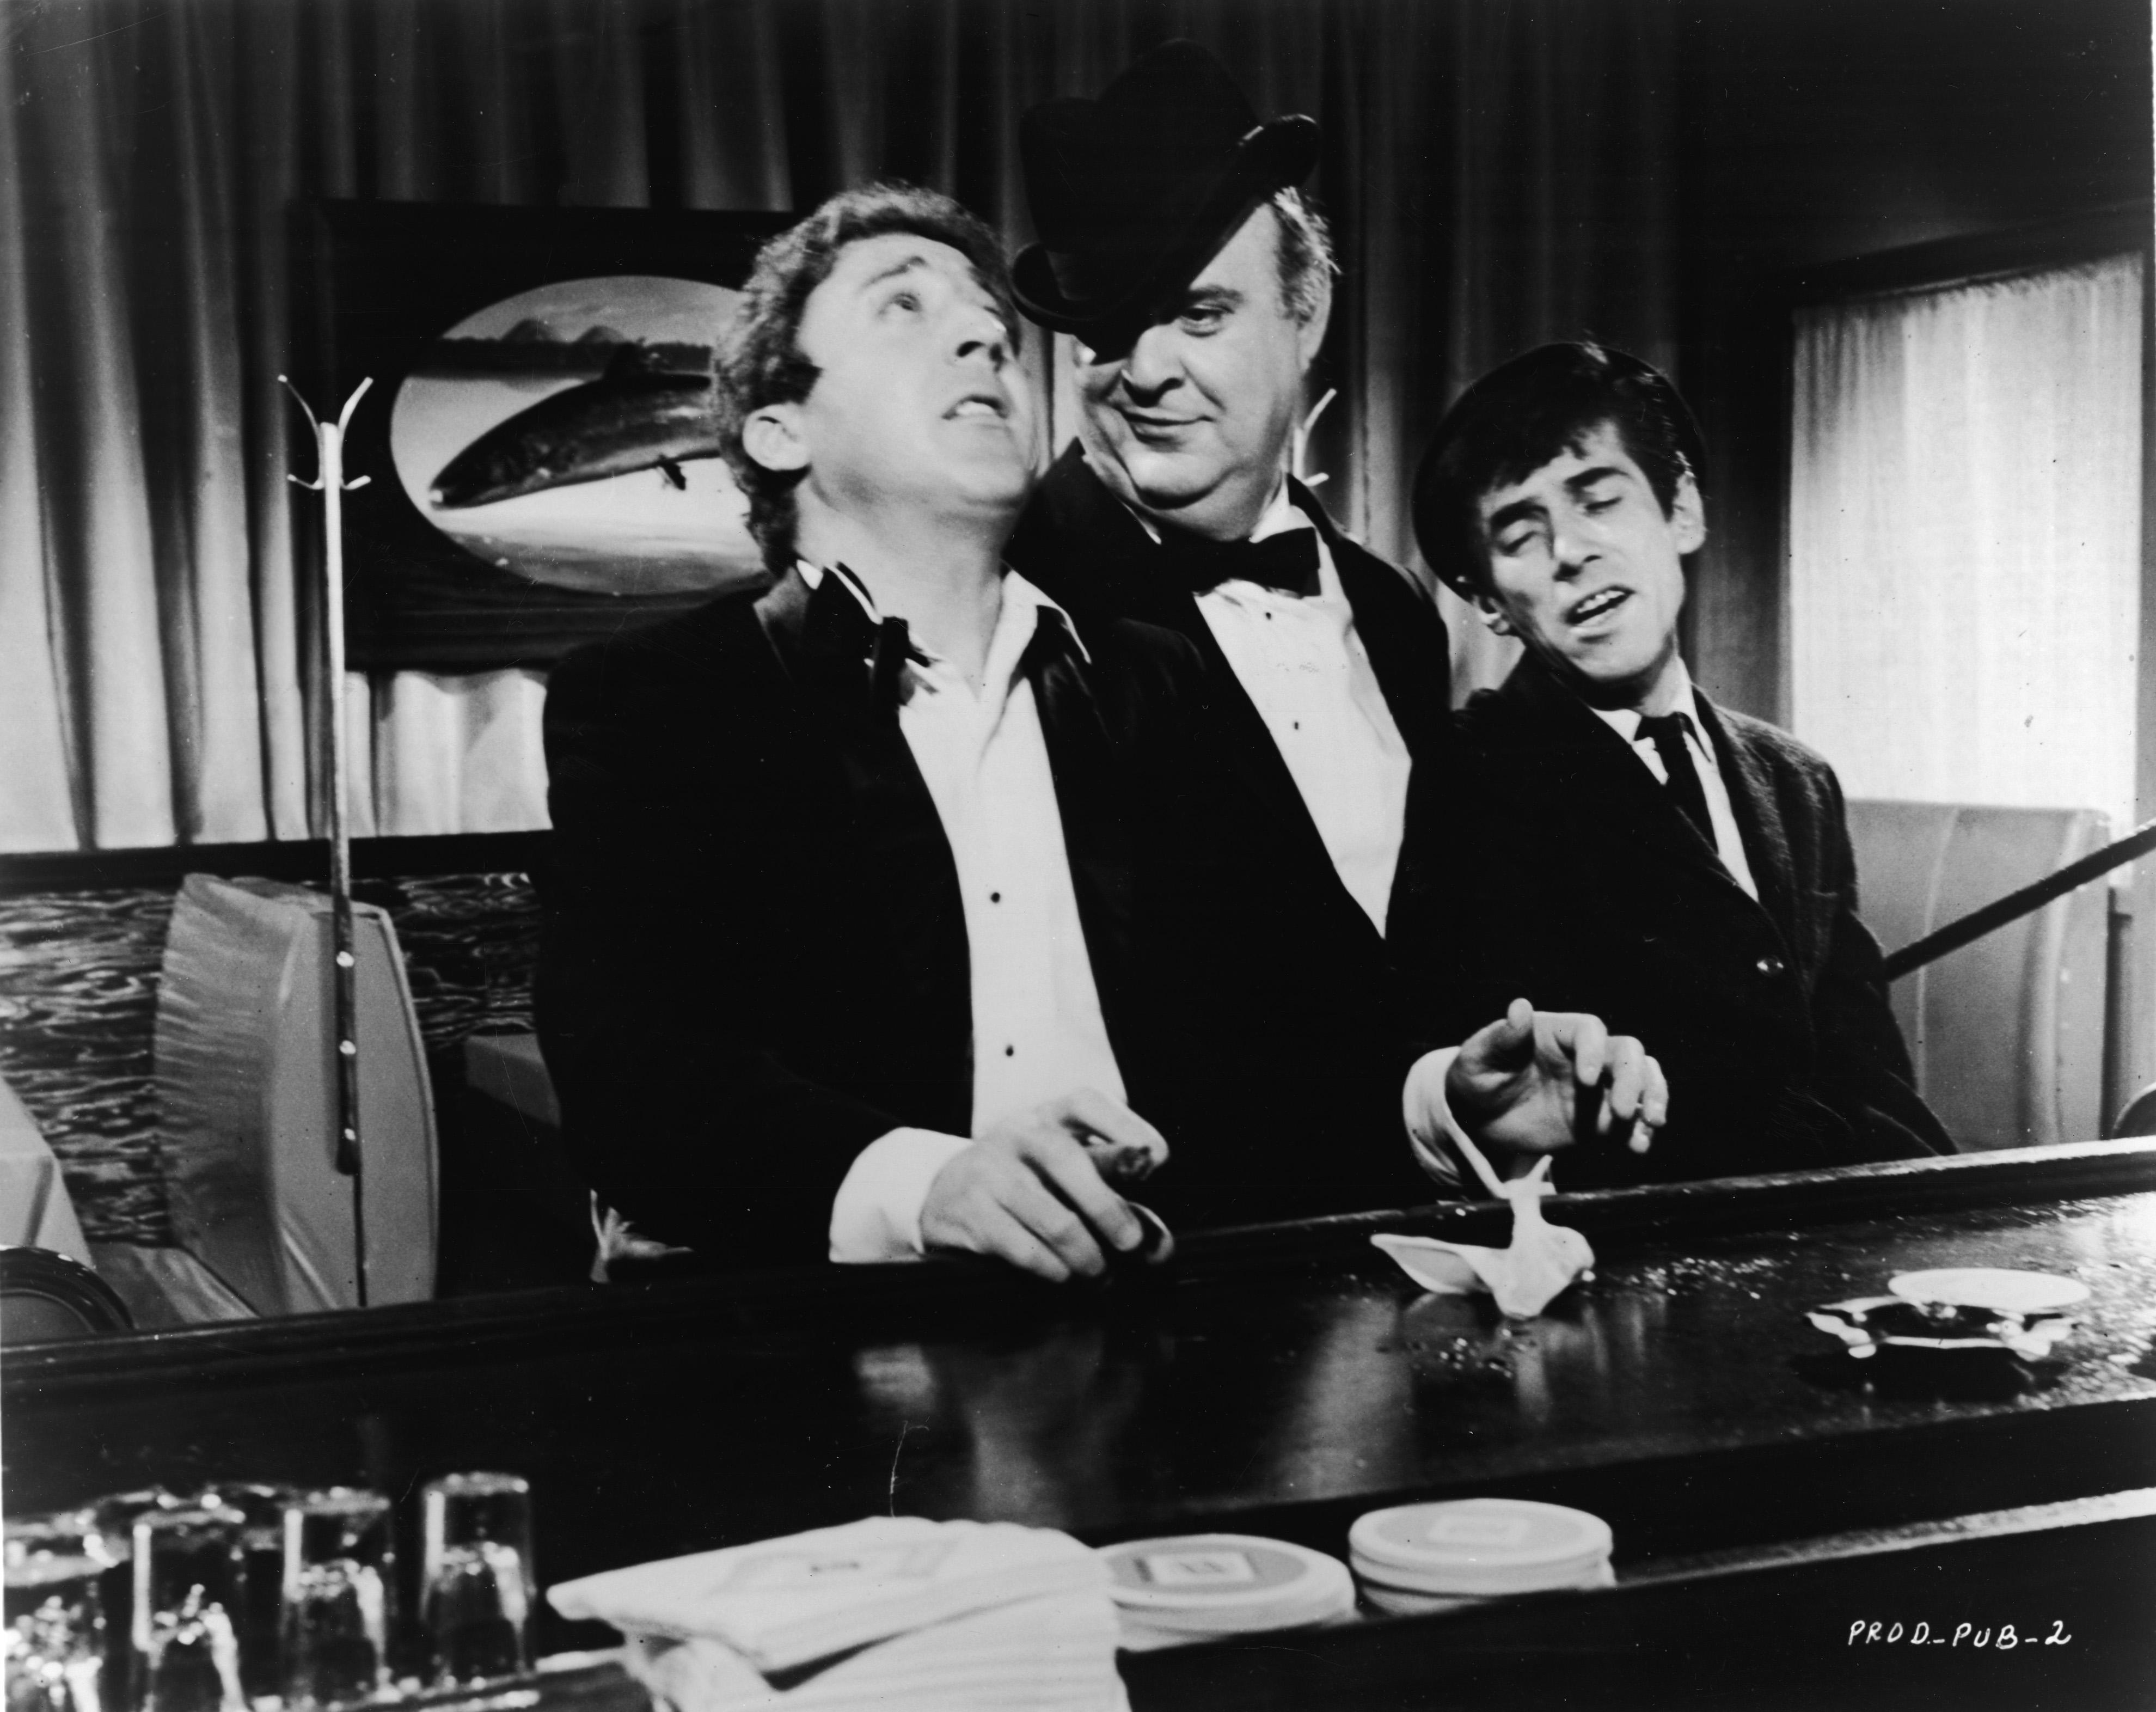 Gene Wilder - Producers